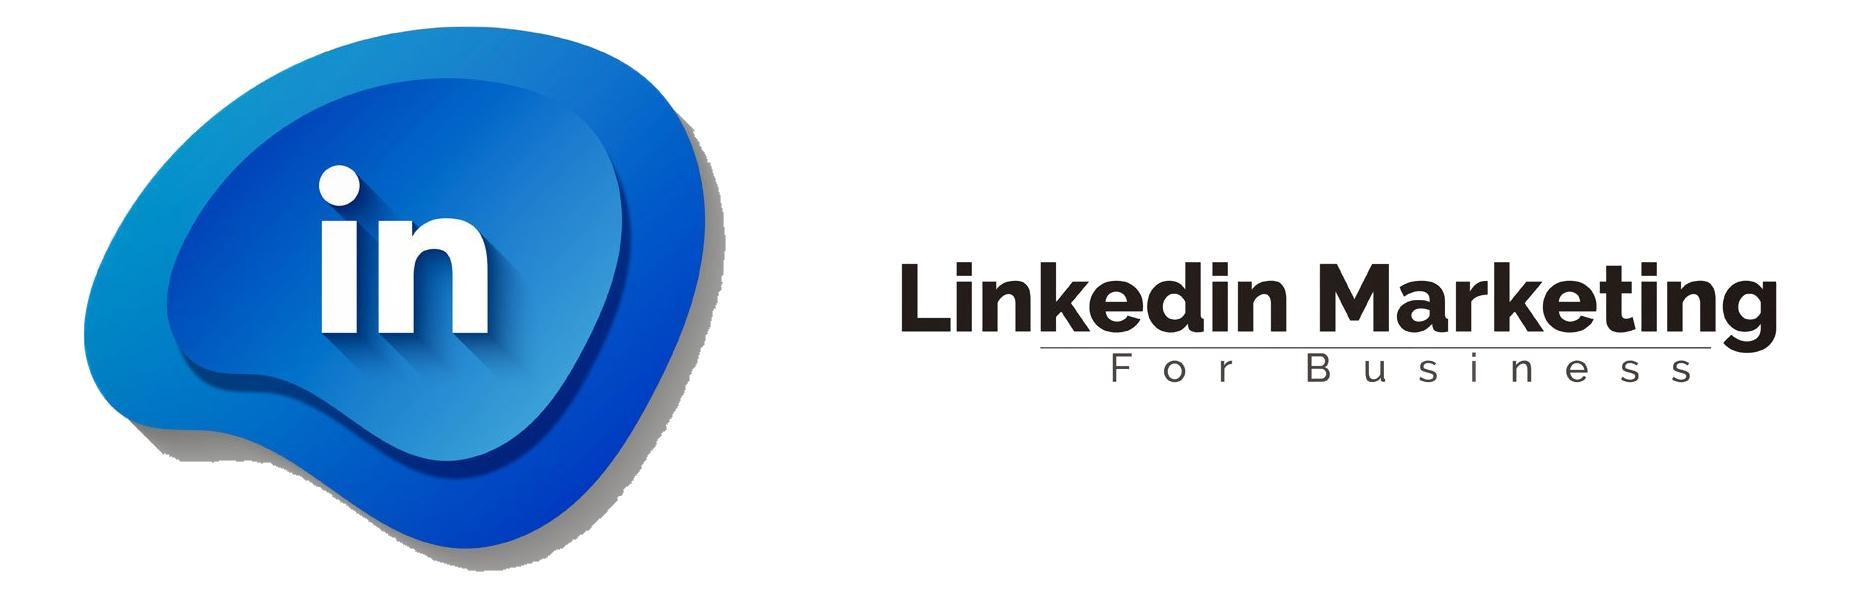 Estrategia en Linkedin para Empresas ¿importa?